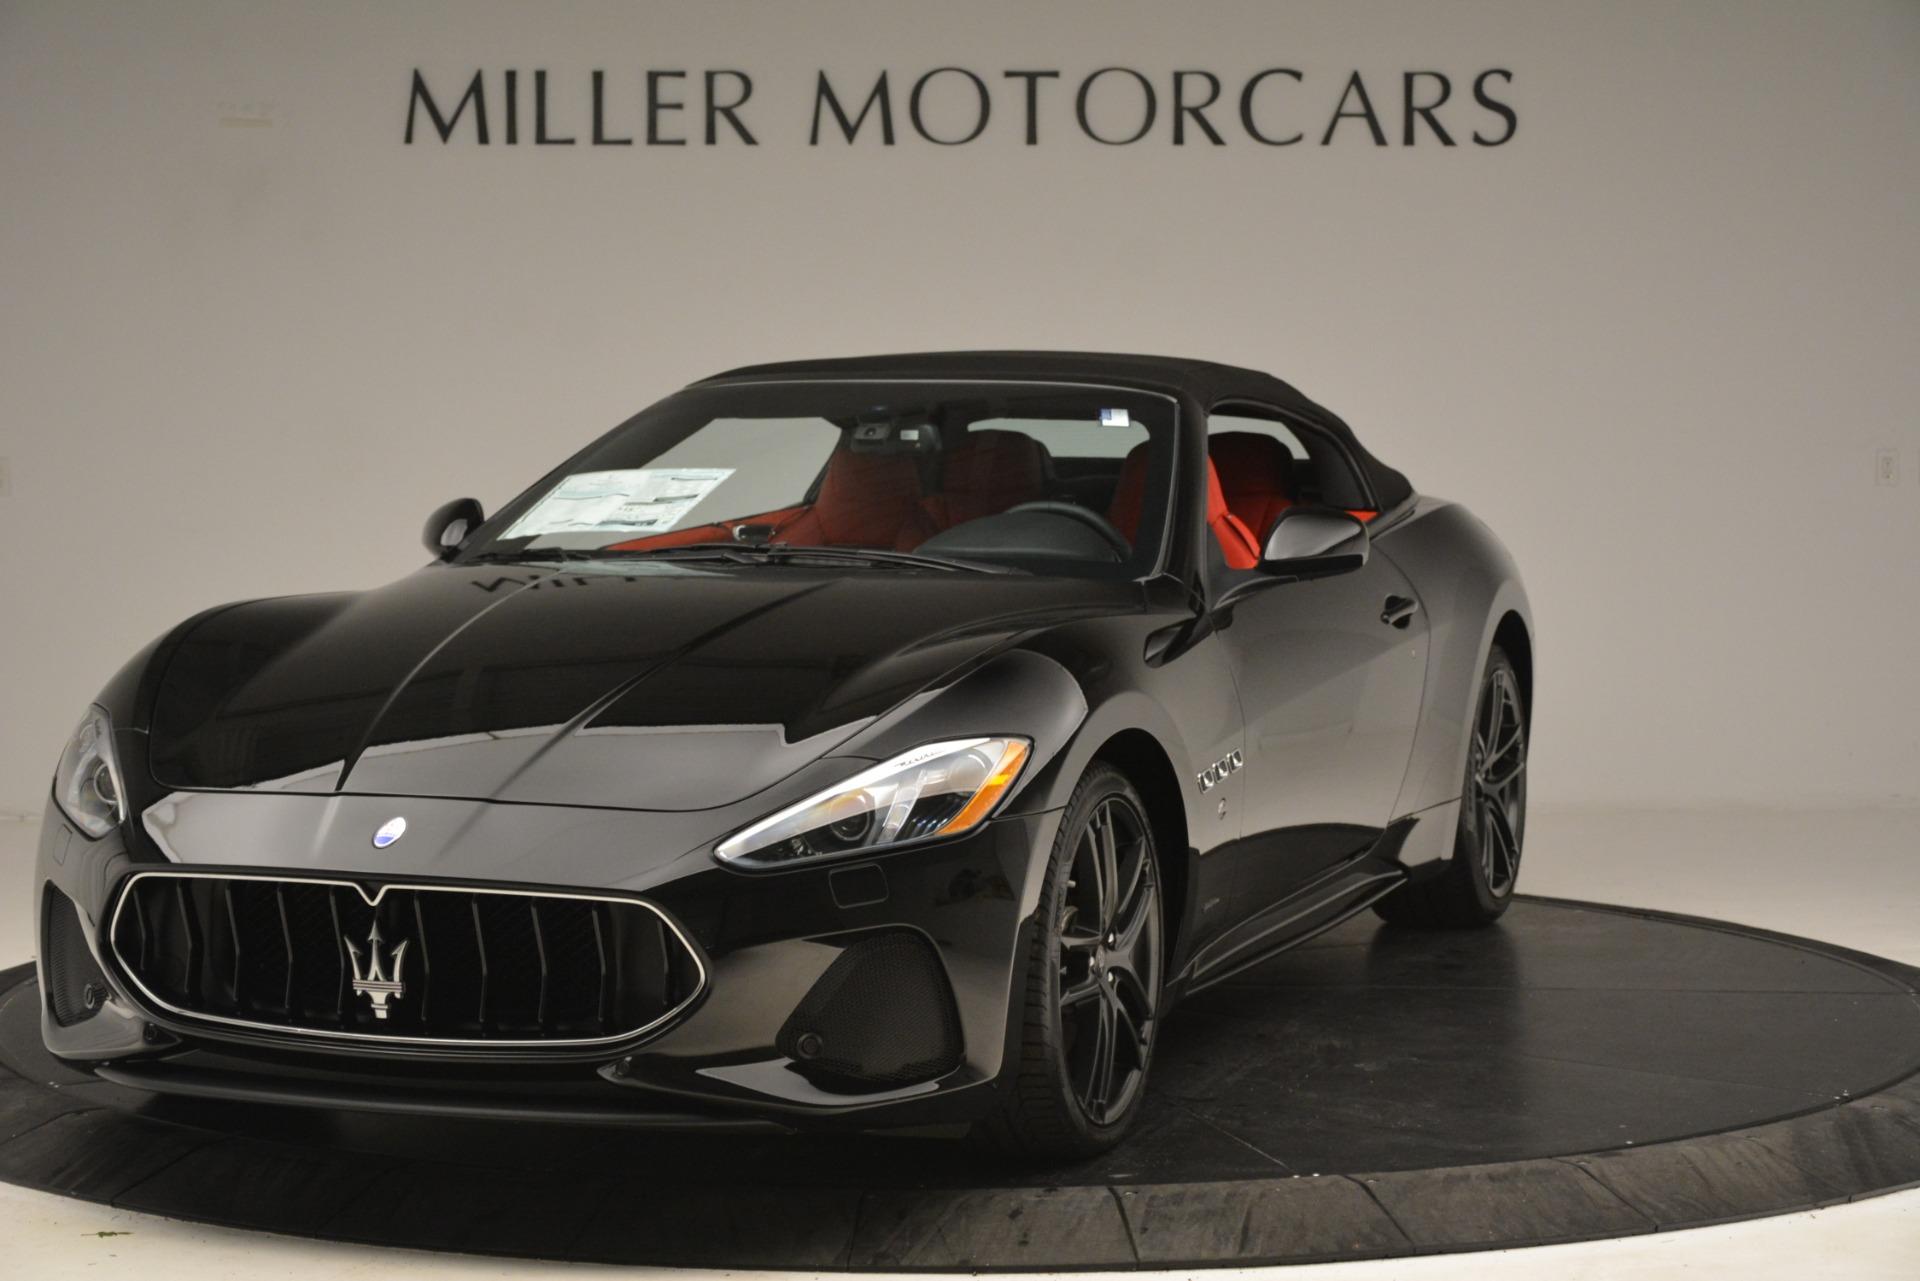 New 2018 Maserati GranTurismo Sport Convertible For Sale In Westport, CT 3137_p2